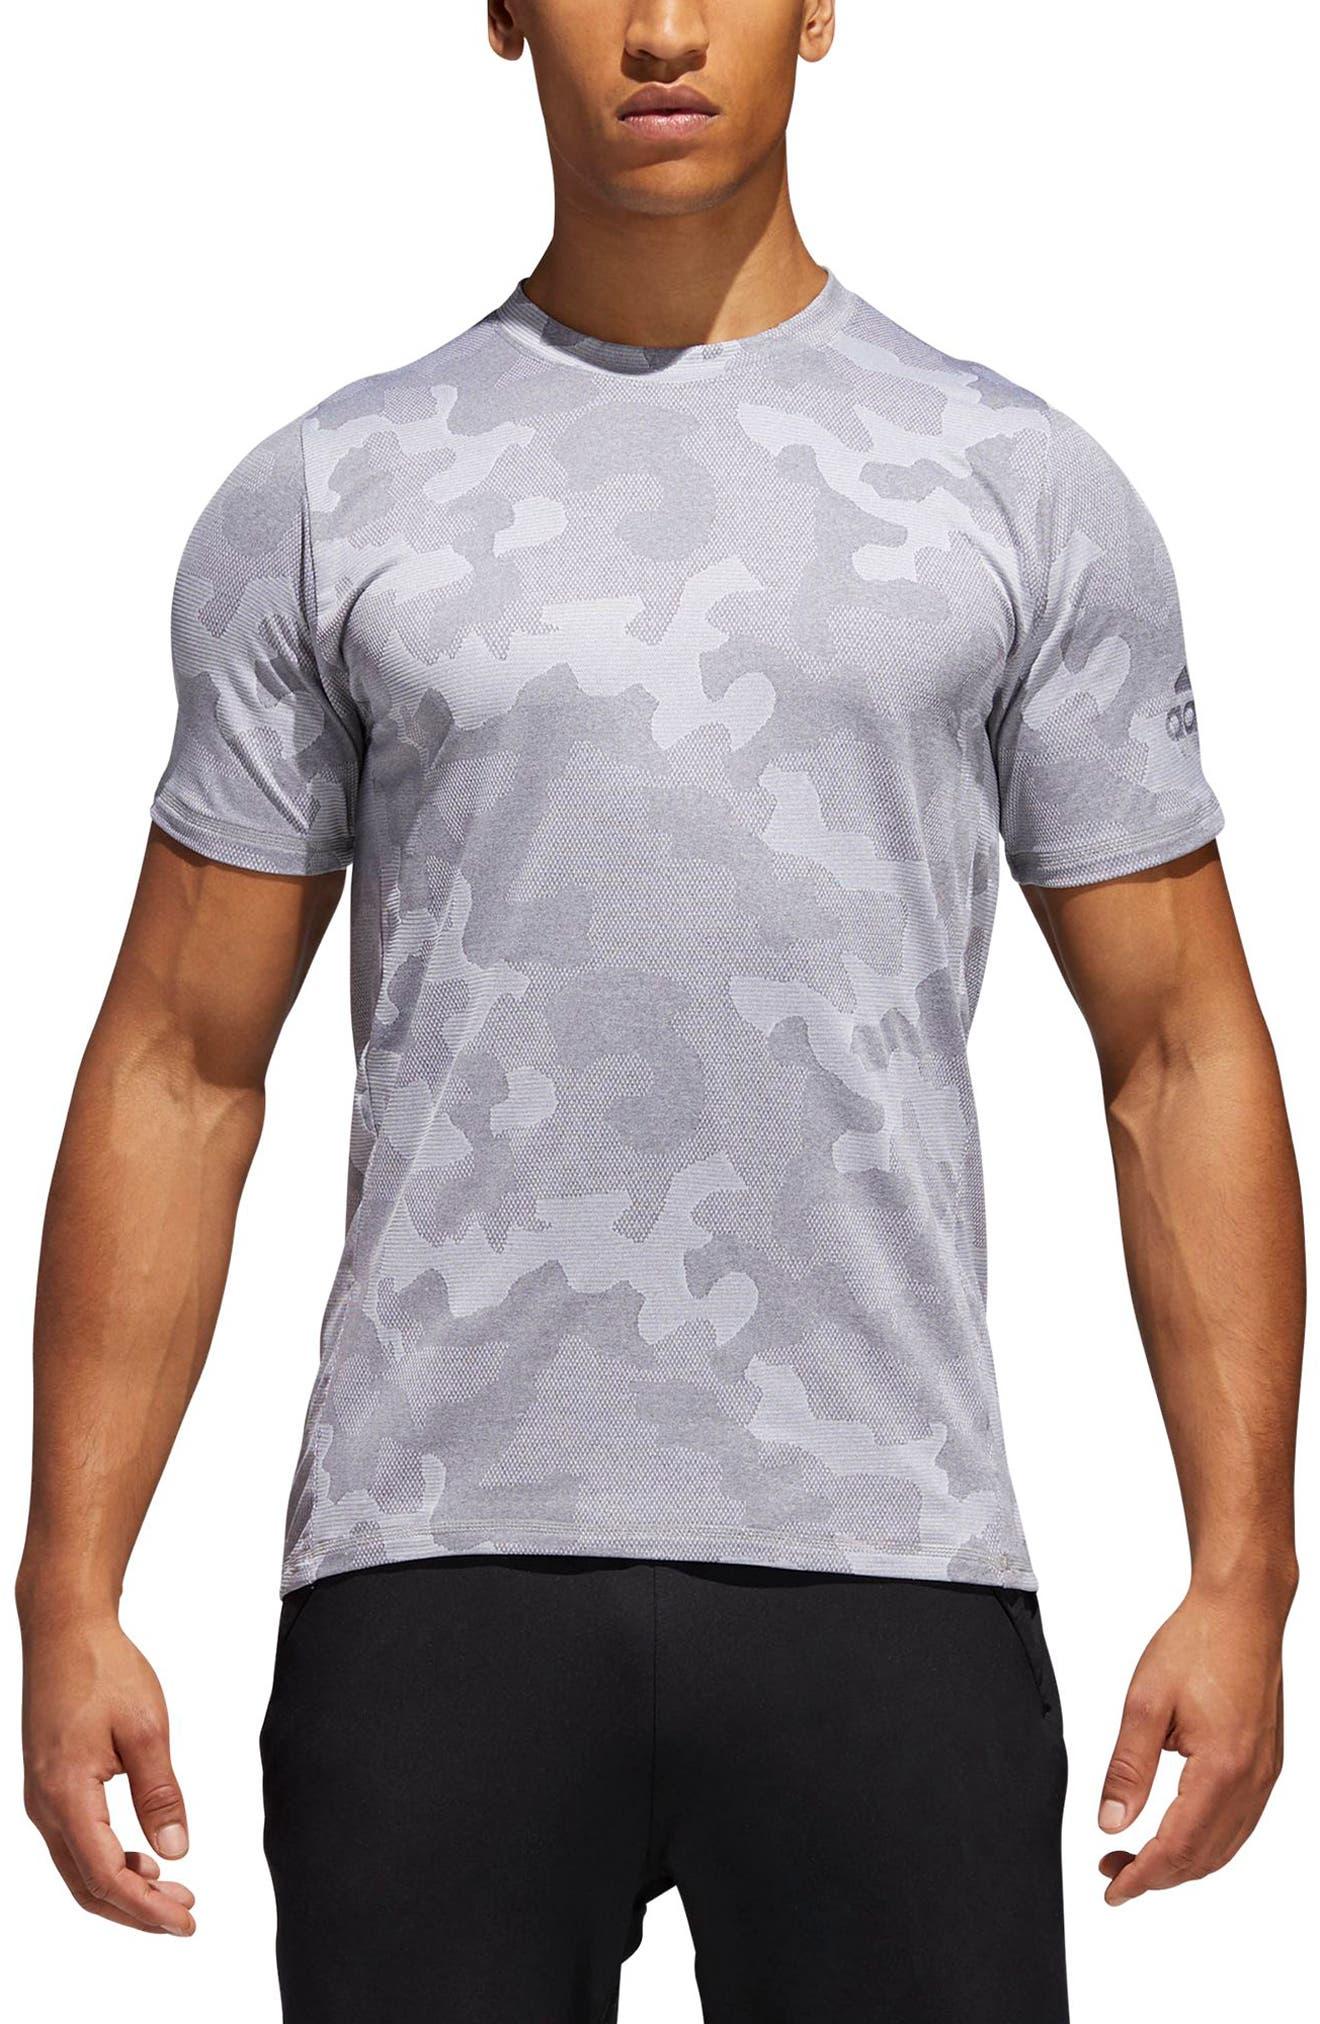 Camo Hype T-Shirt,                             Main thumbnail 1, color,                             036